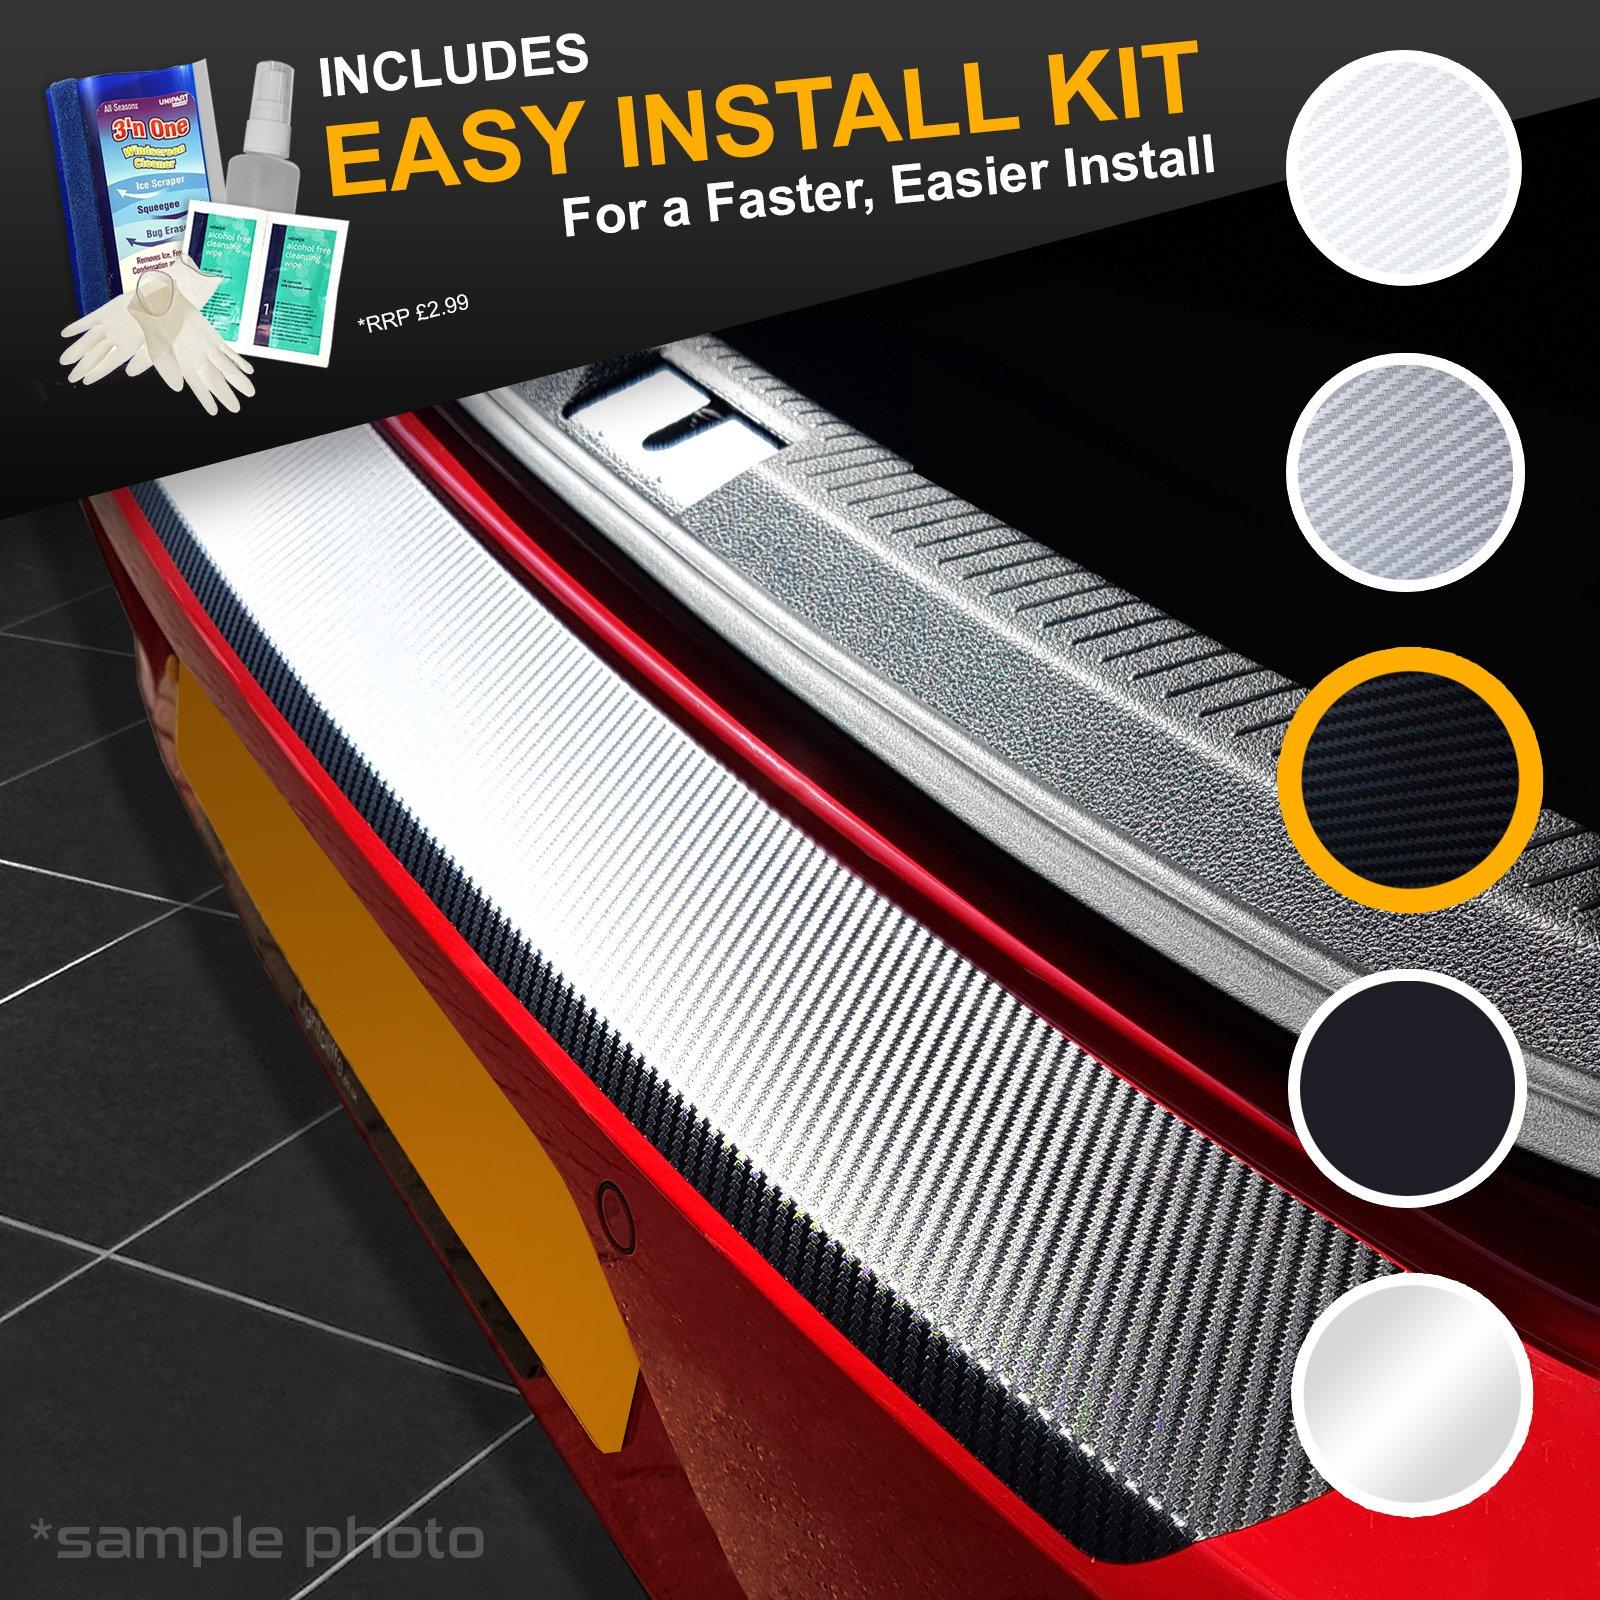 carmats4u Black Carbon Vinyl Bumper Lip Protector//Self Adhesive Easy Install Kit Included